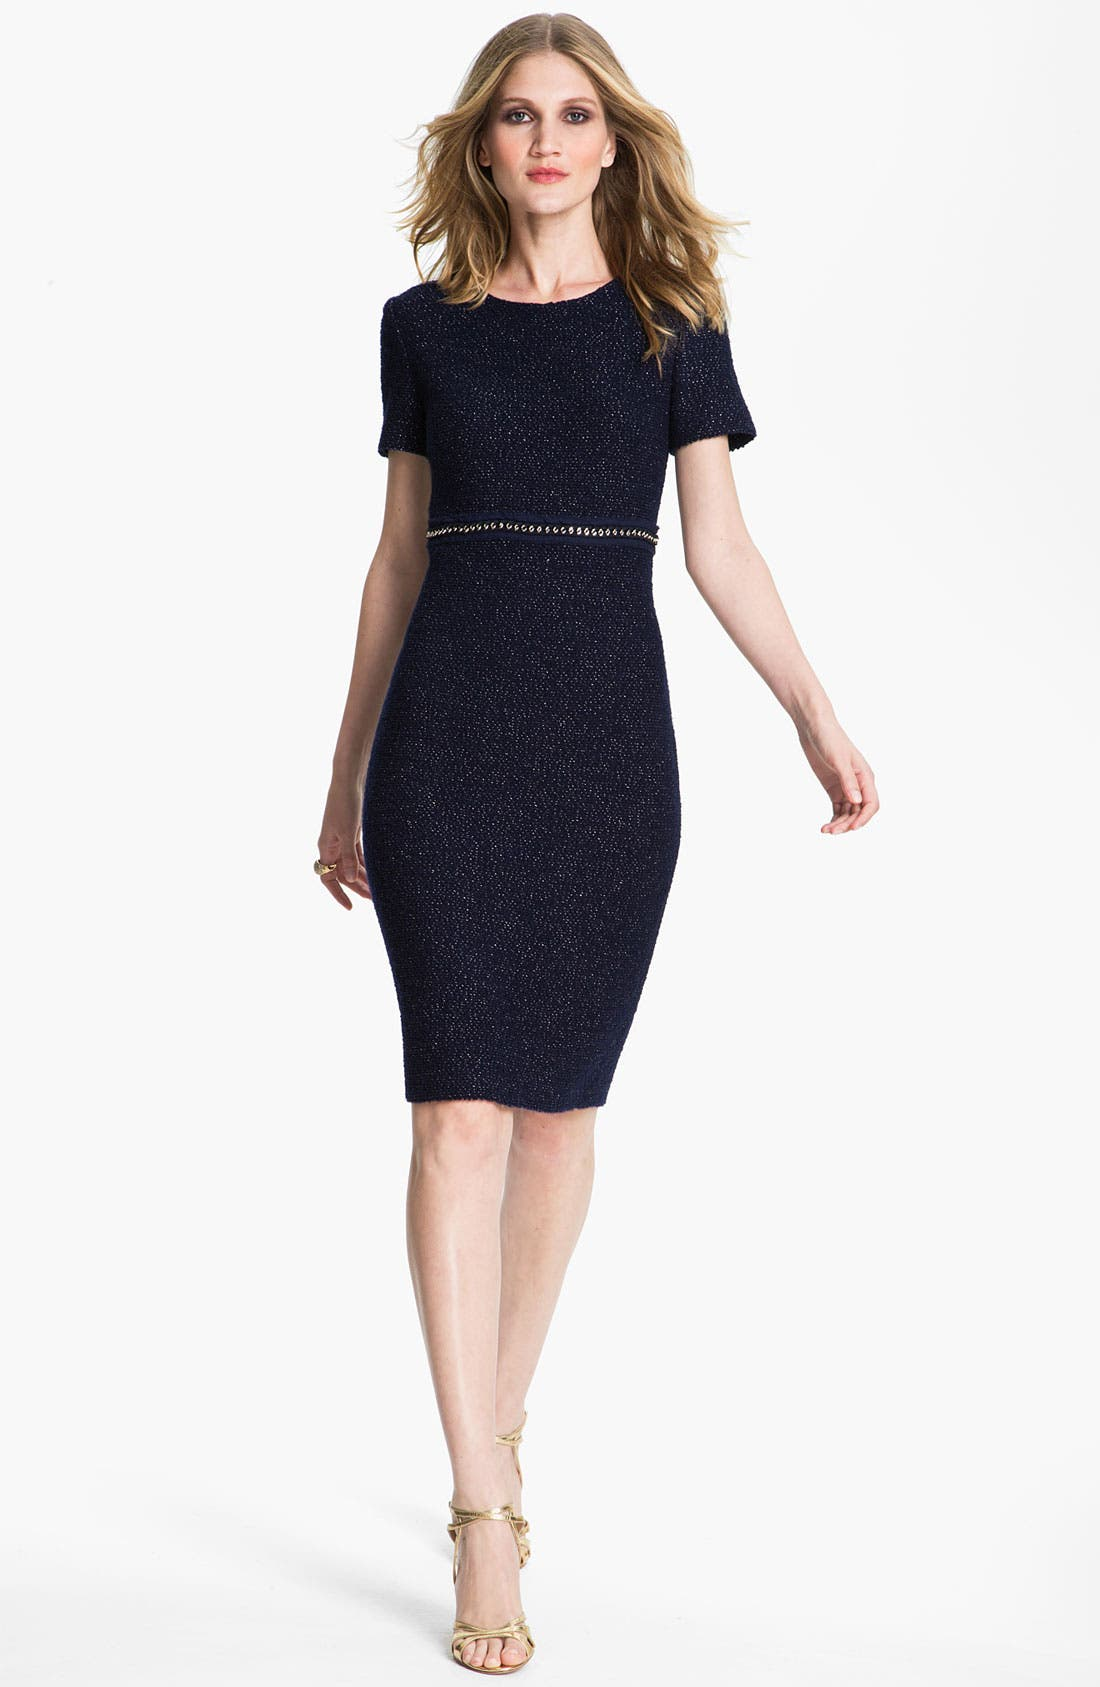 Alternate Image 1 Selected - St. John Collection Shimmer Bouclette Dress